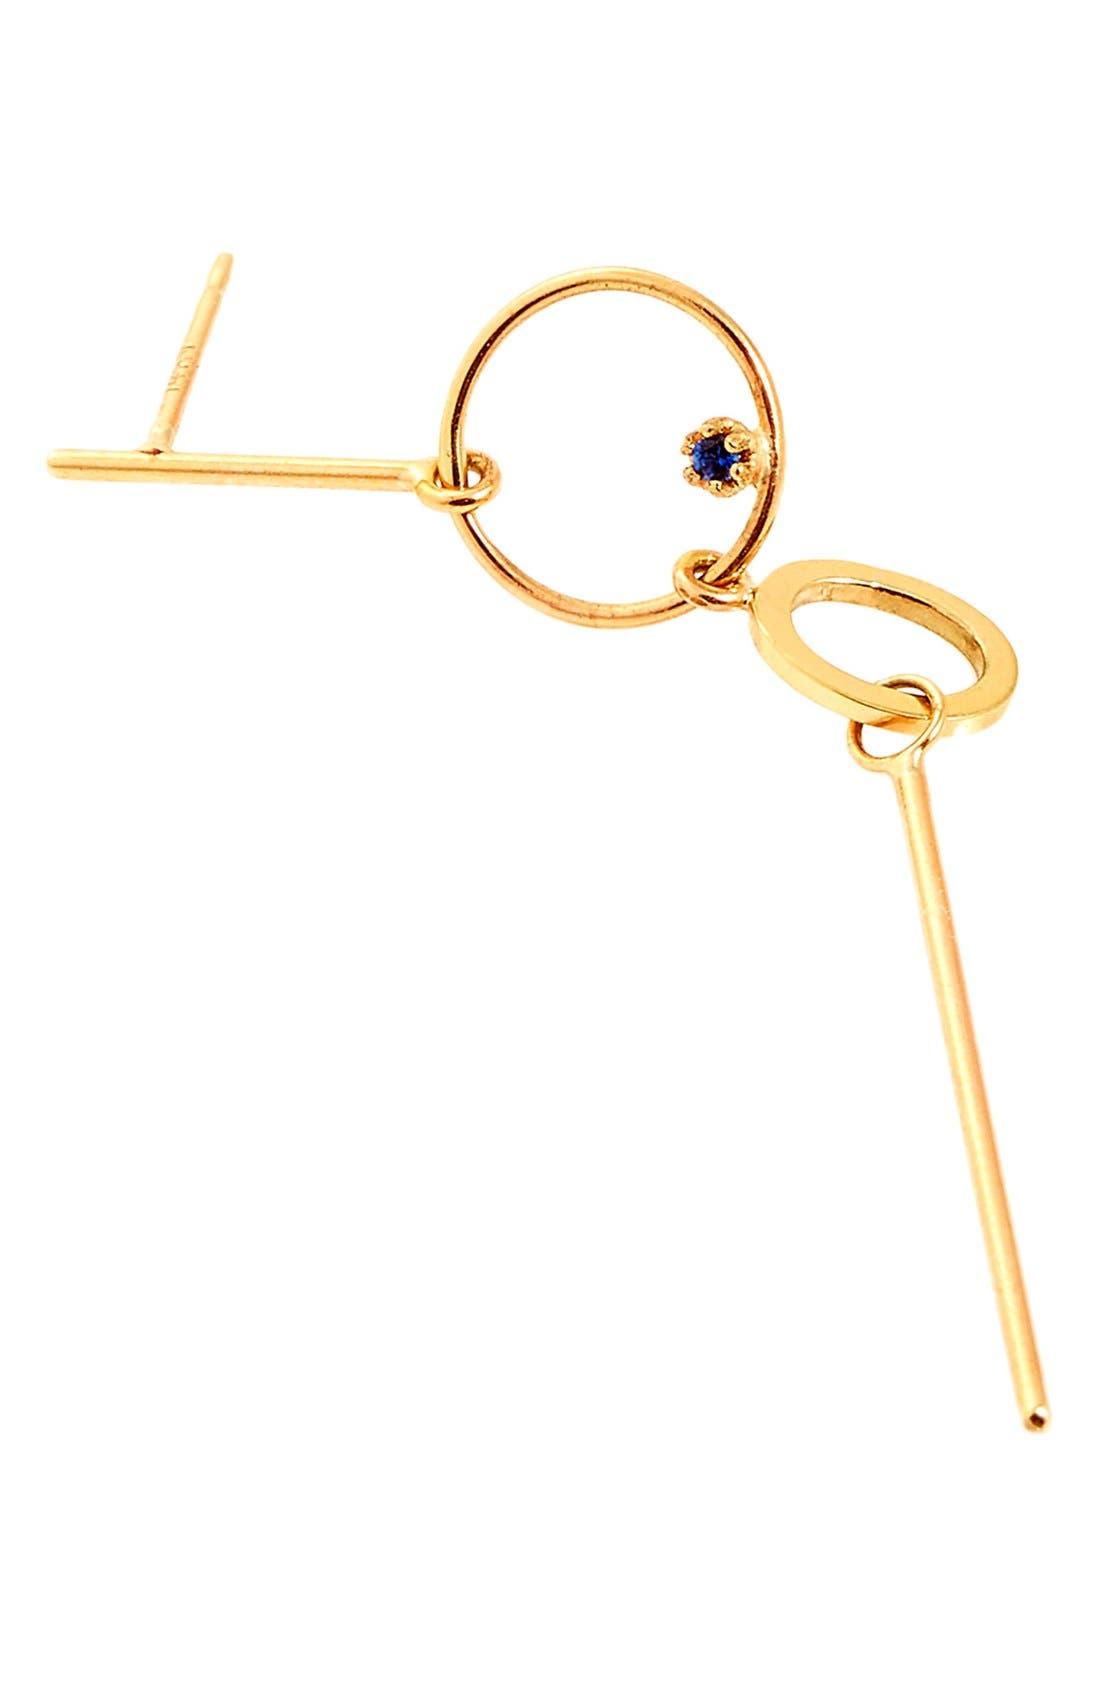 Alternate Image 1 Selected - SARAH & SEBASTIAN 'Long Bubble' Gold & Sapphire Statement Earring